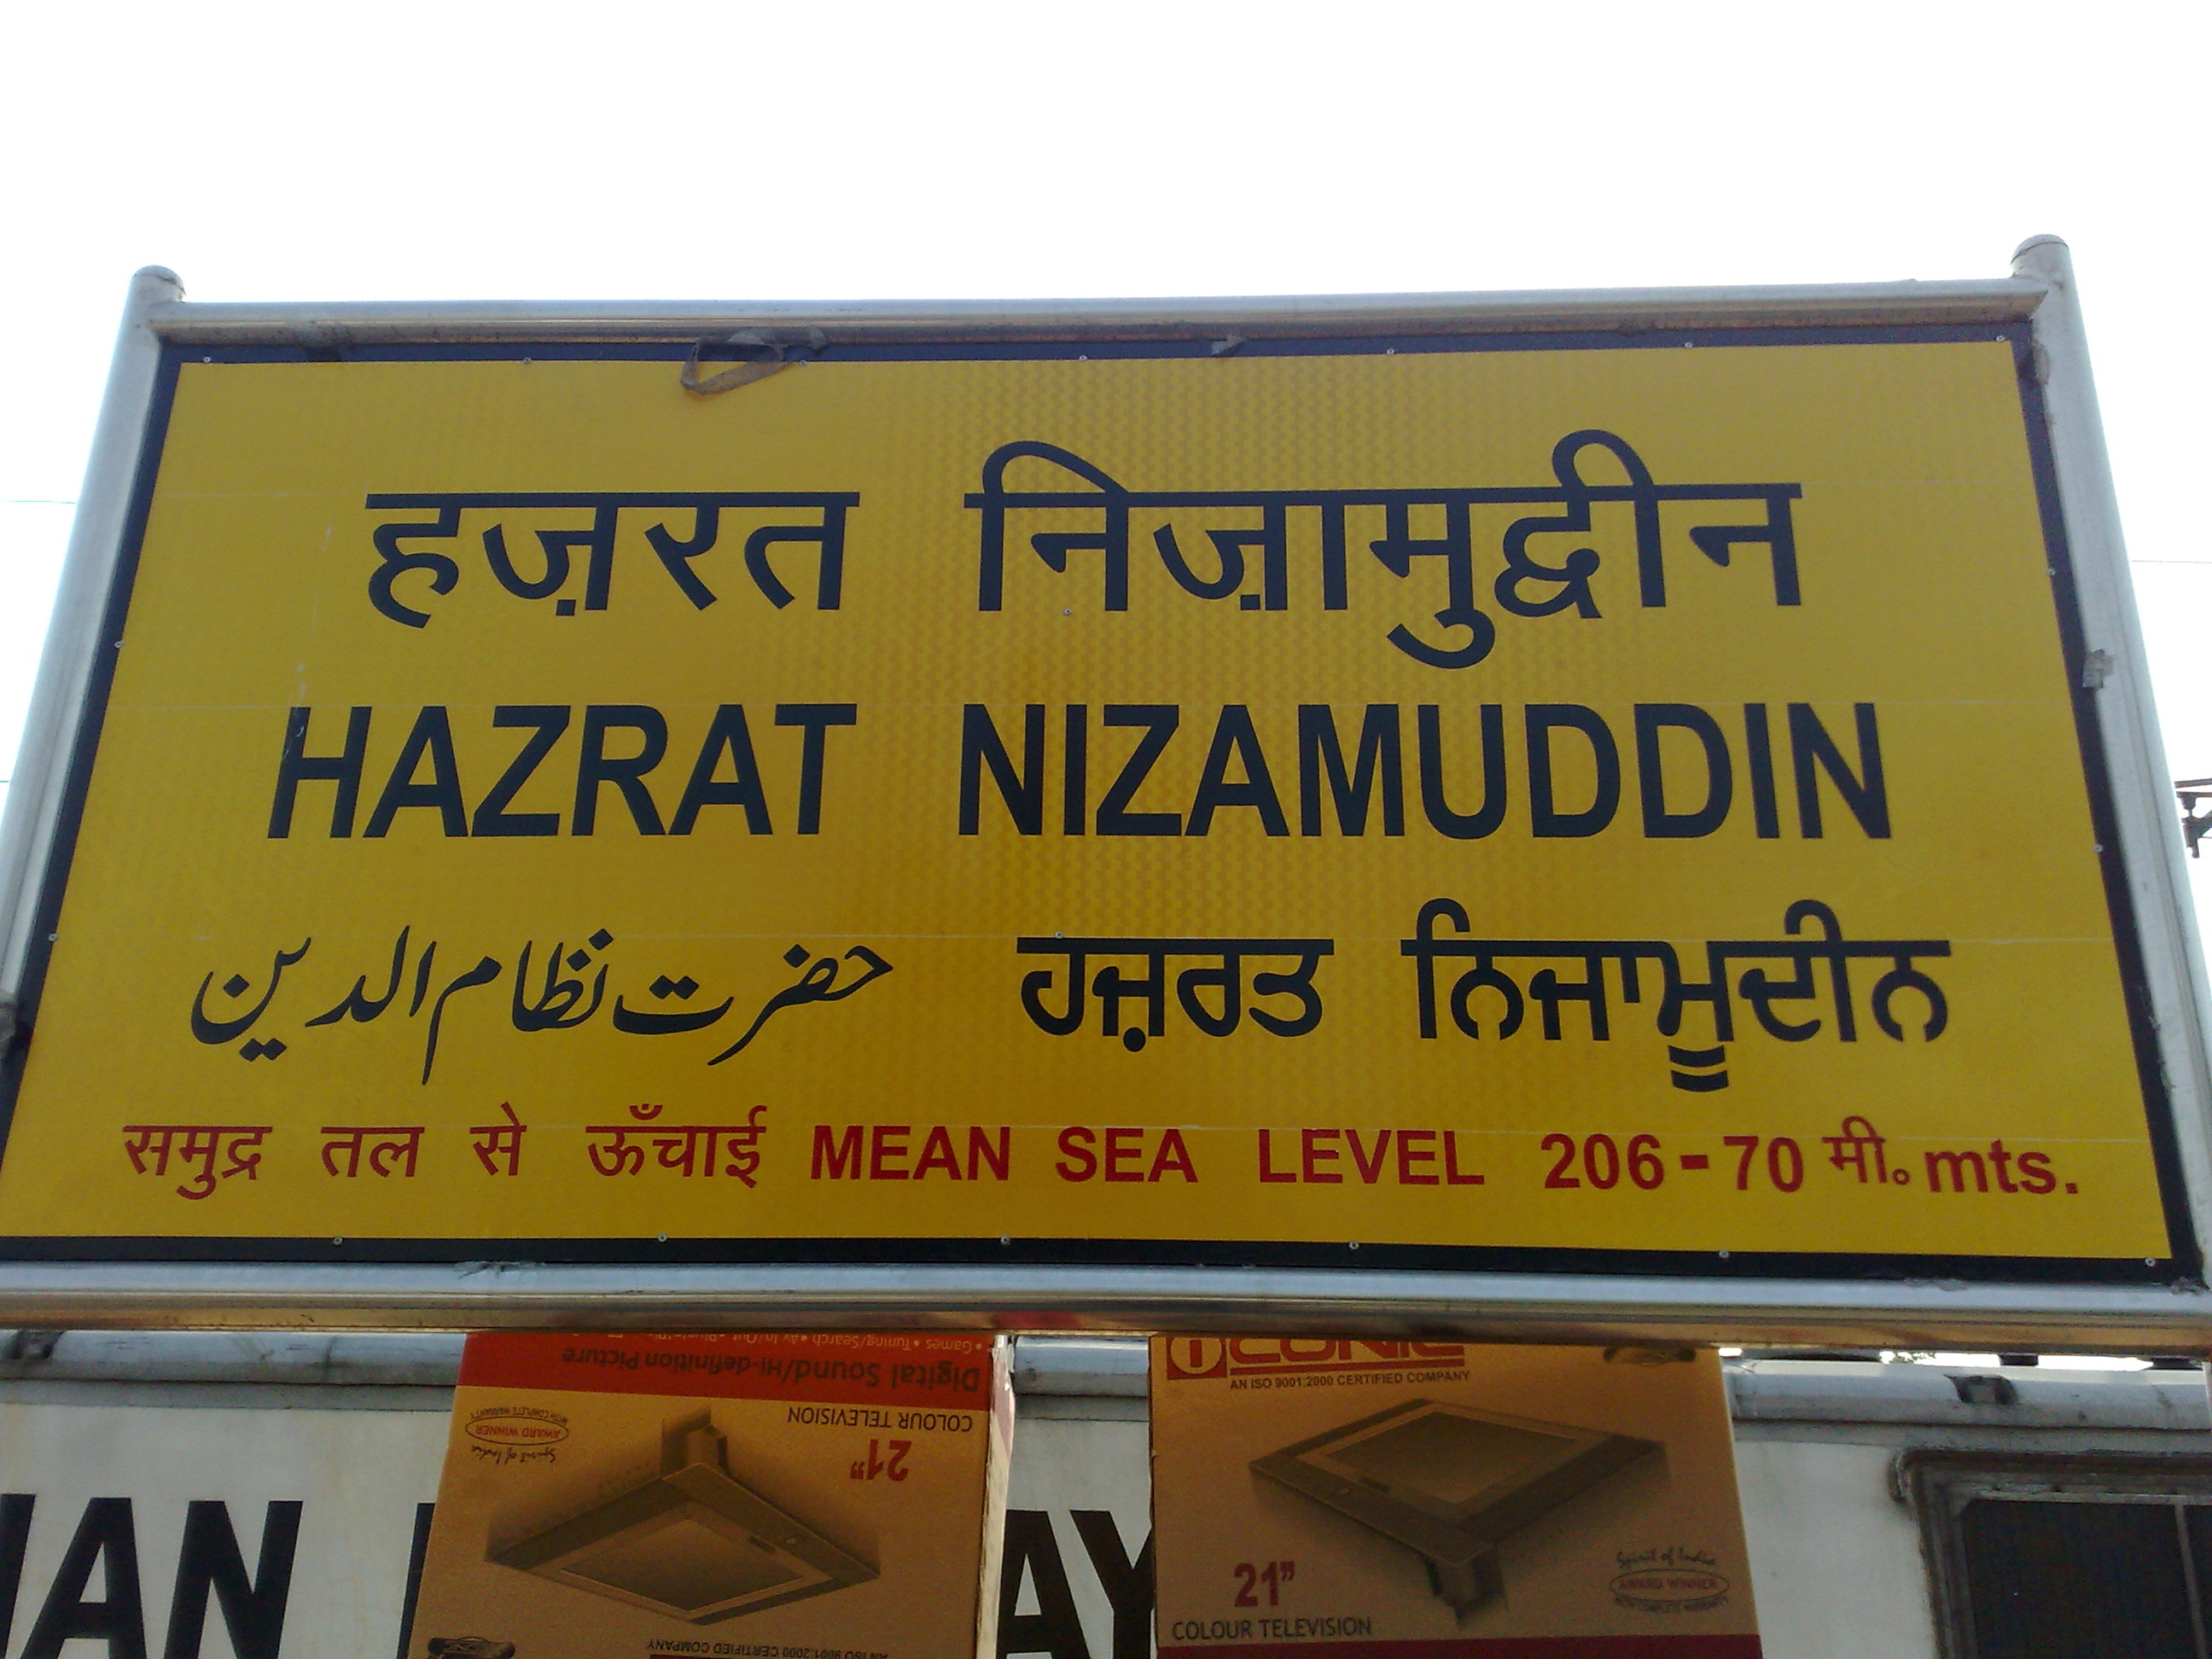 हजरत निजामुद्दीन रेलवे स्टेशन